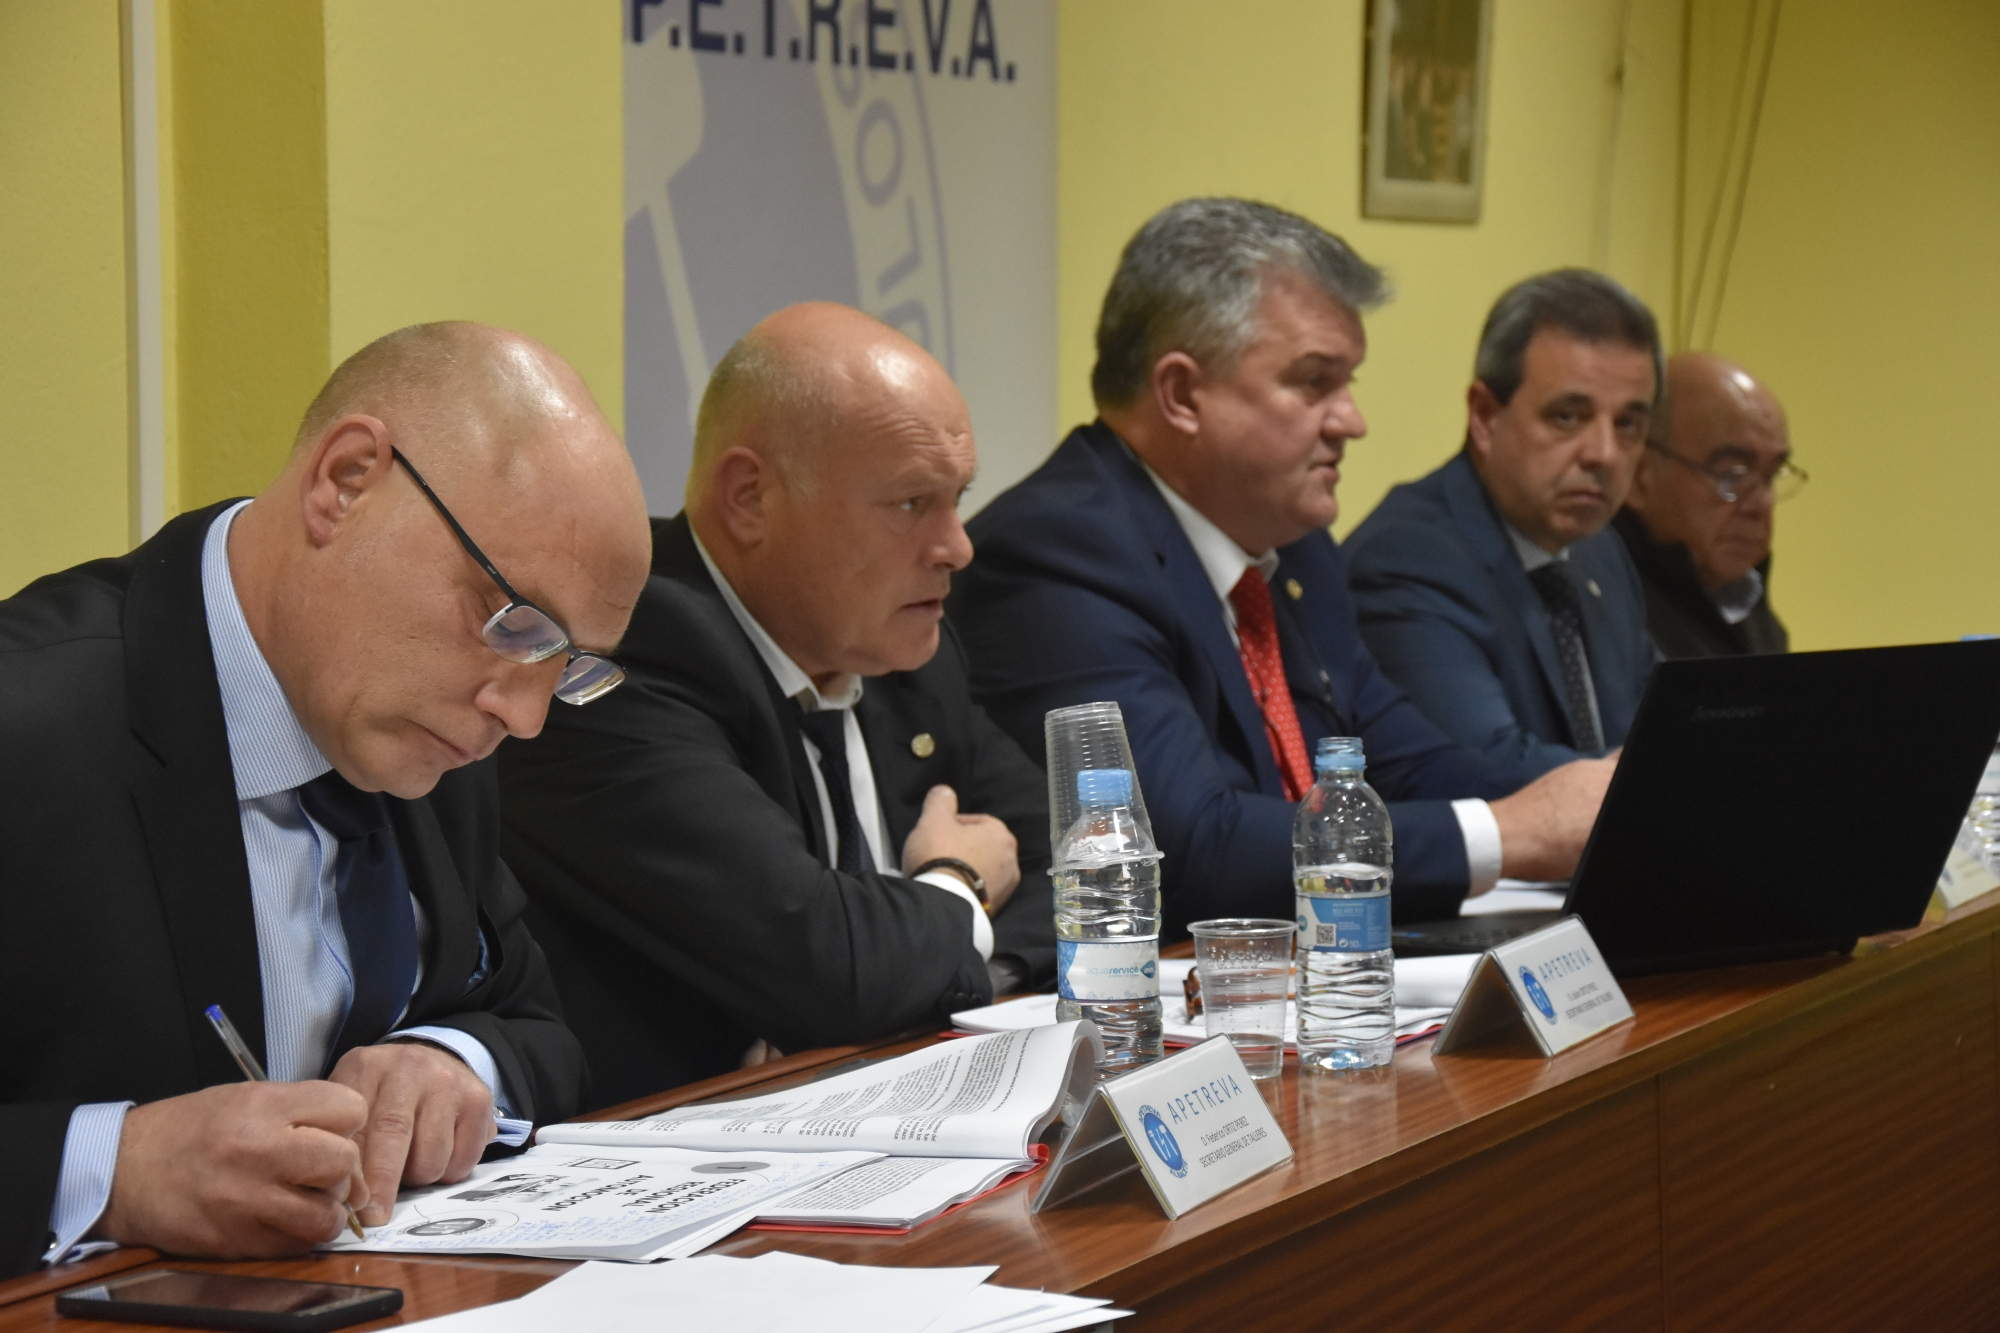 APETREVA celebra su Asamblea General 2018